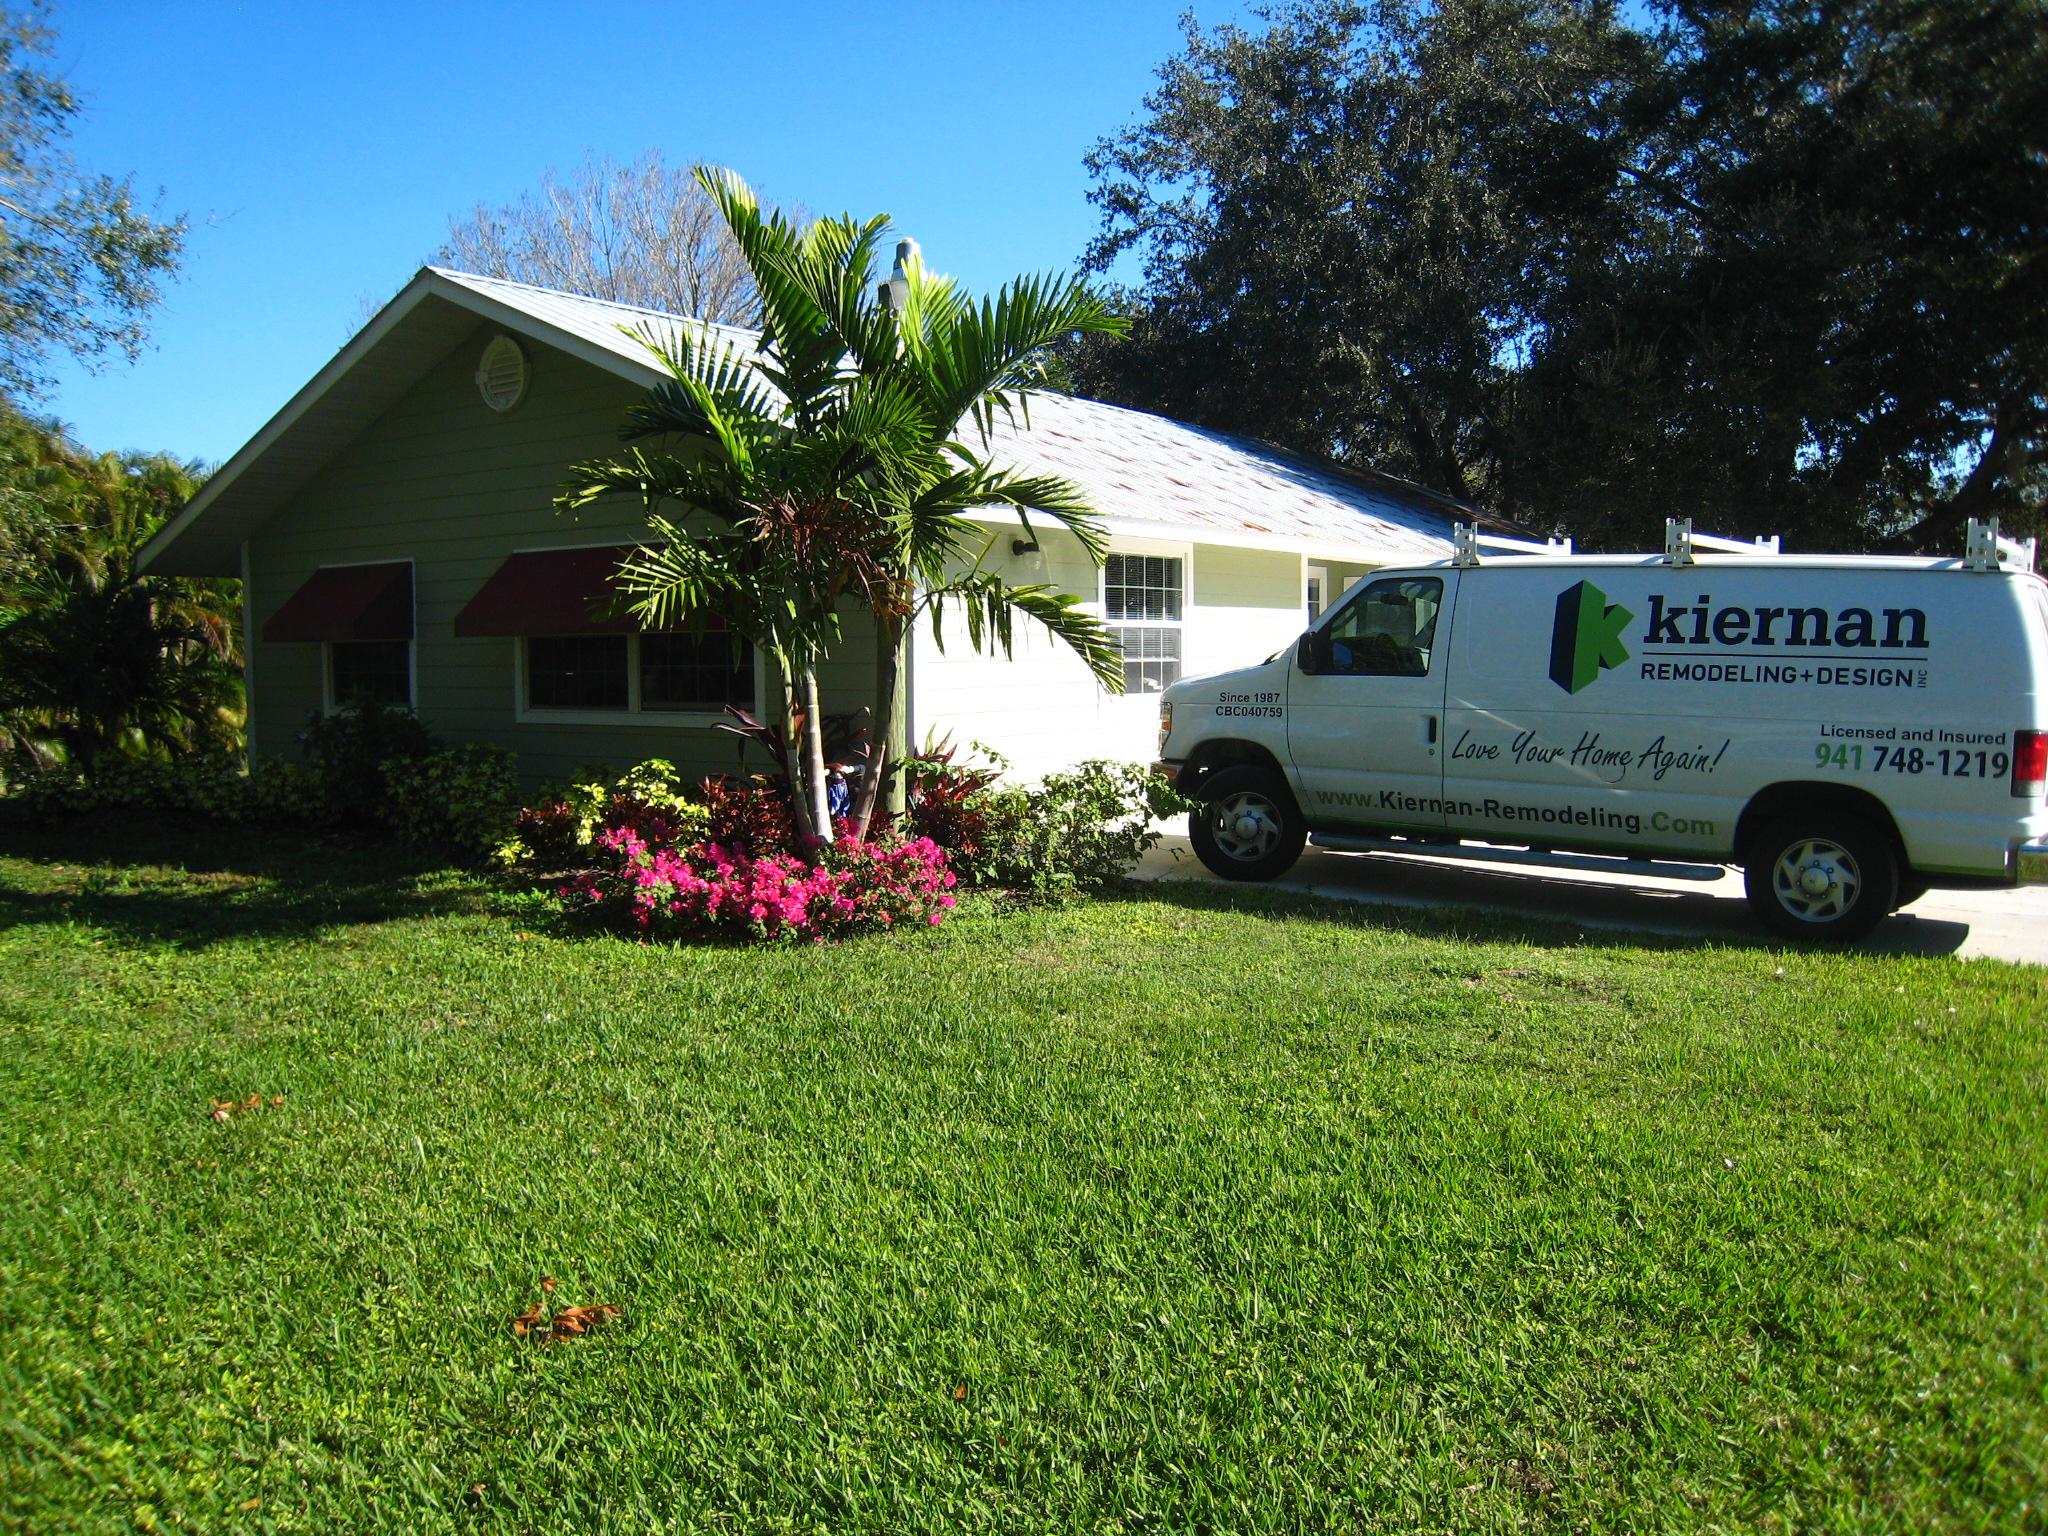 Kiernan Remodeling Amp Design Inc Bradenton Florida Fl